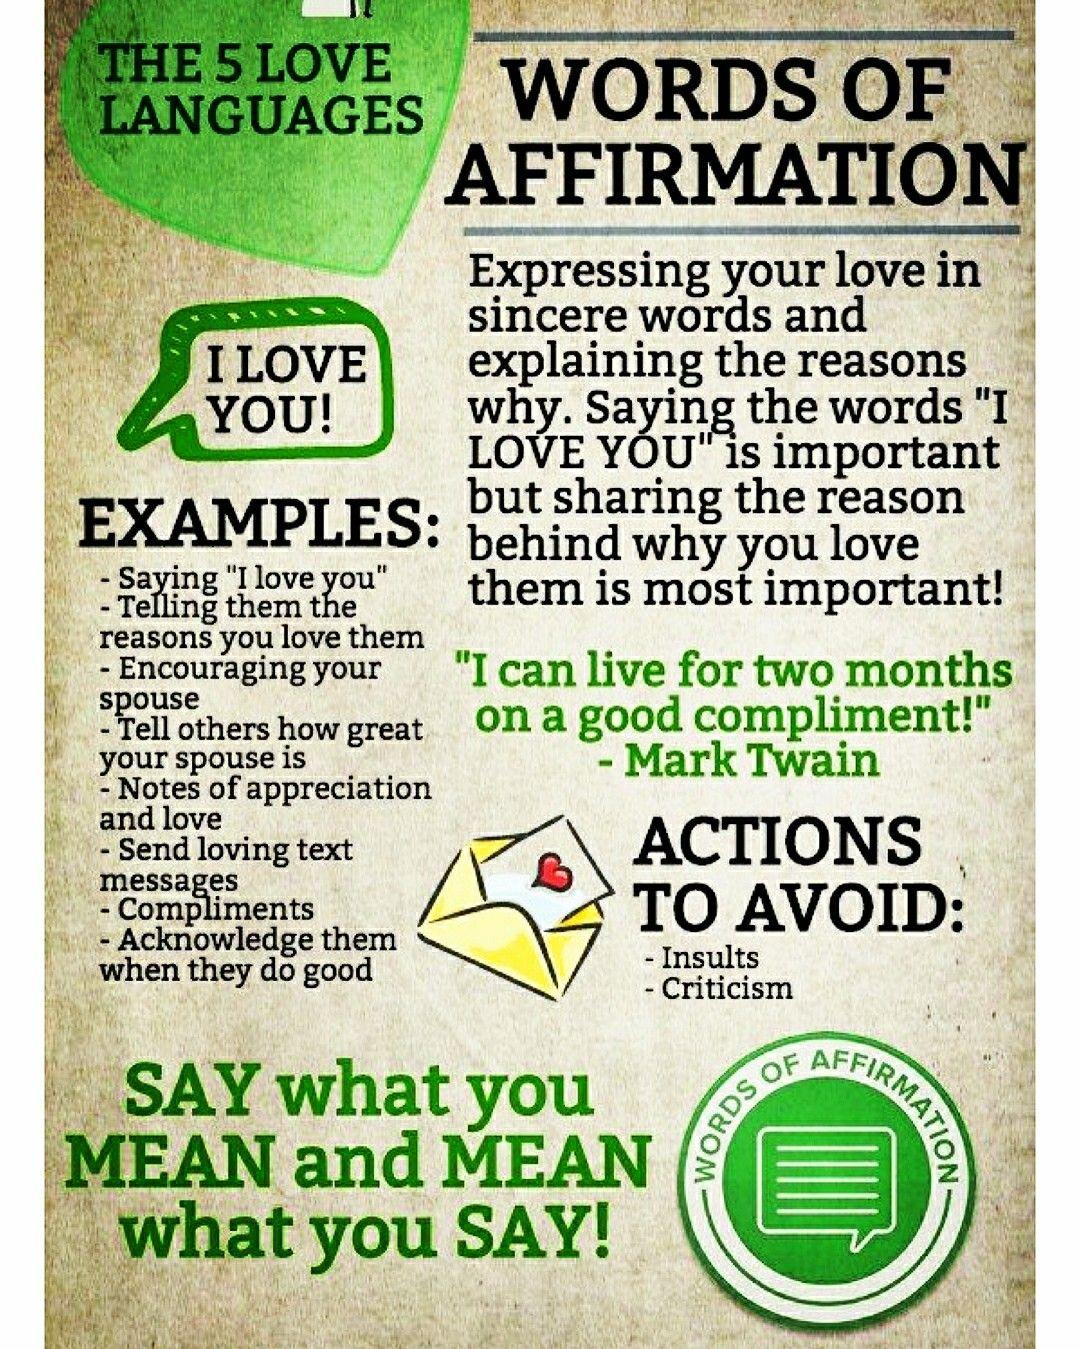 Love Language Words Of Affirmation 5 Love Languages Love Languages Words Of Affirmation